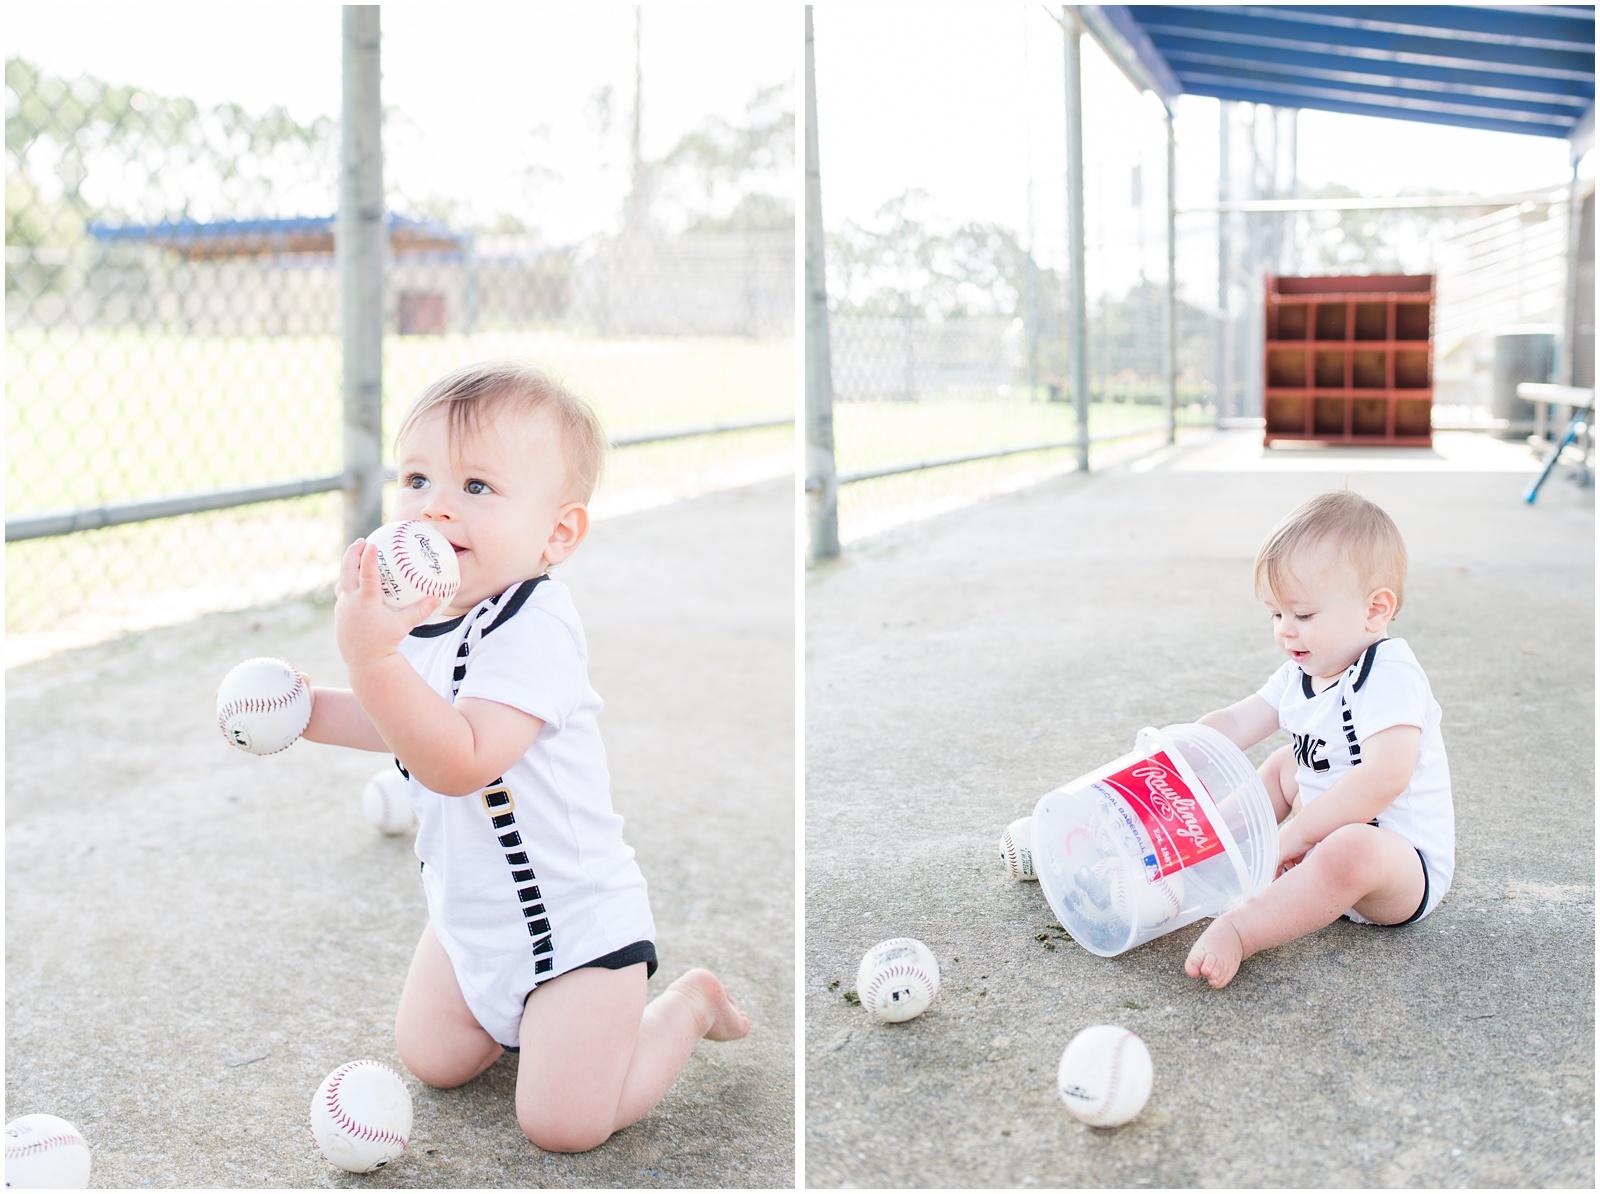 One Year_Baby_Portraits_Baseball_Field_7.jpg